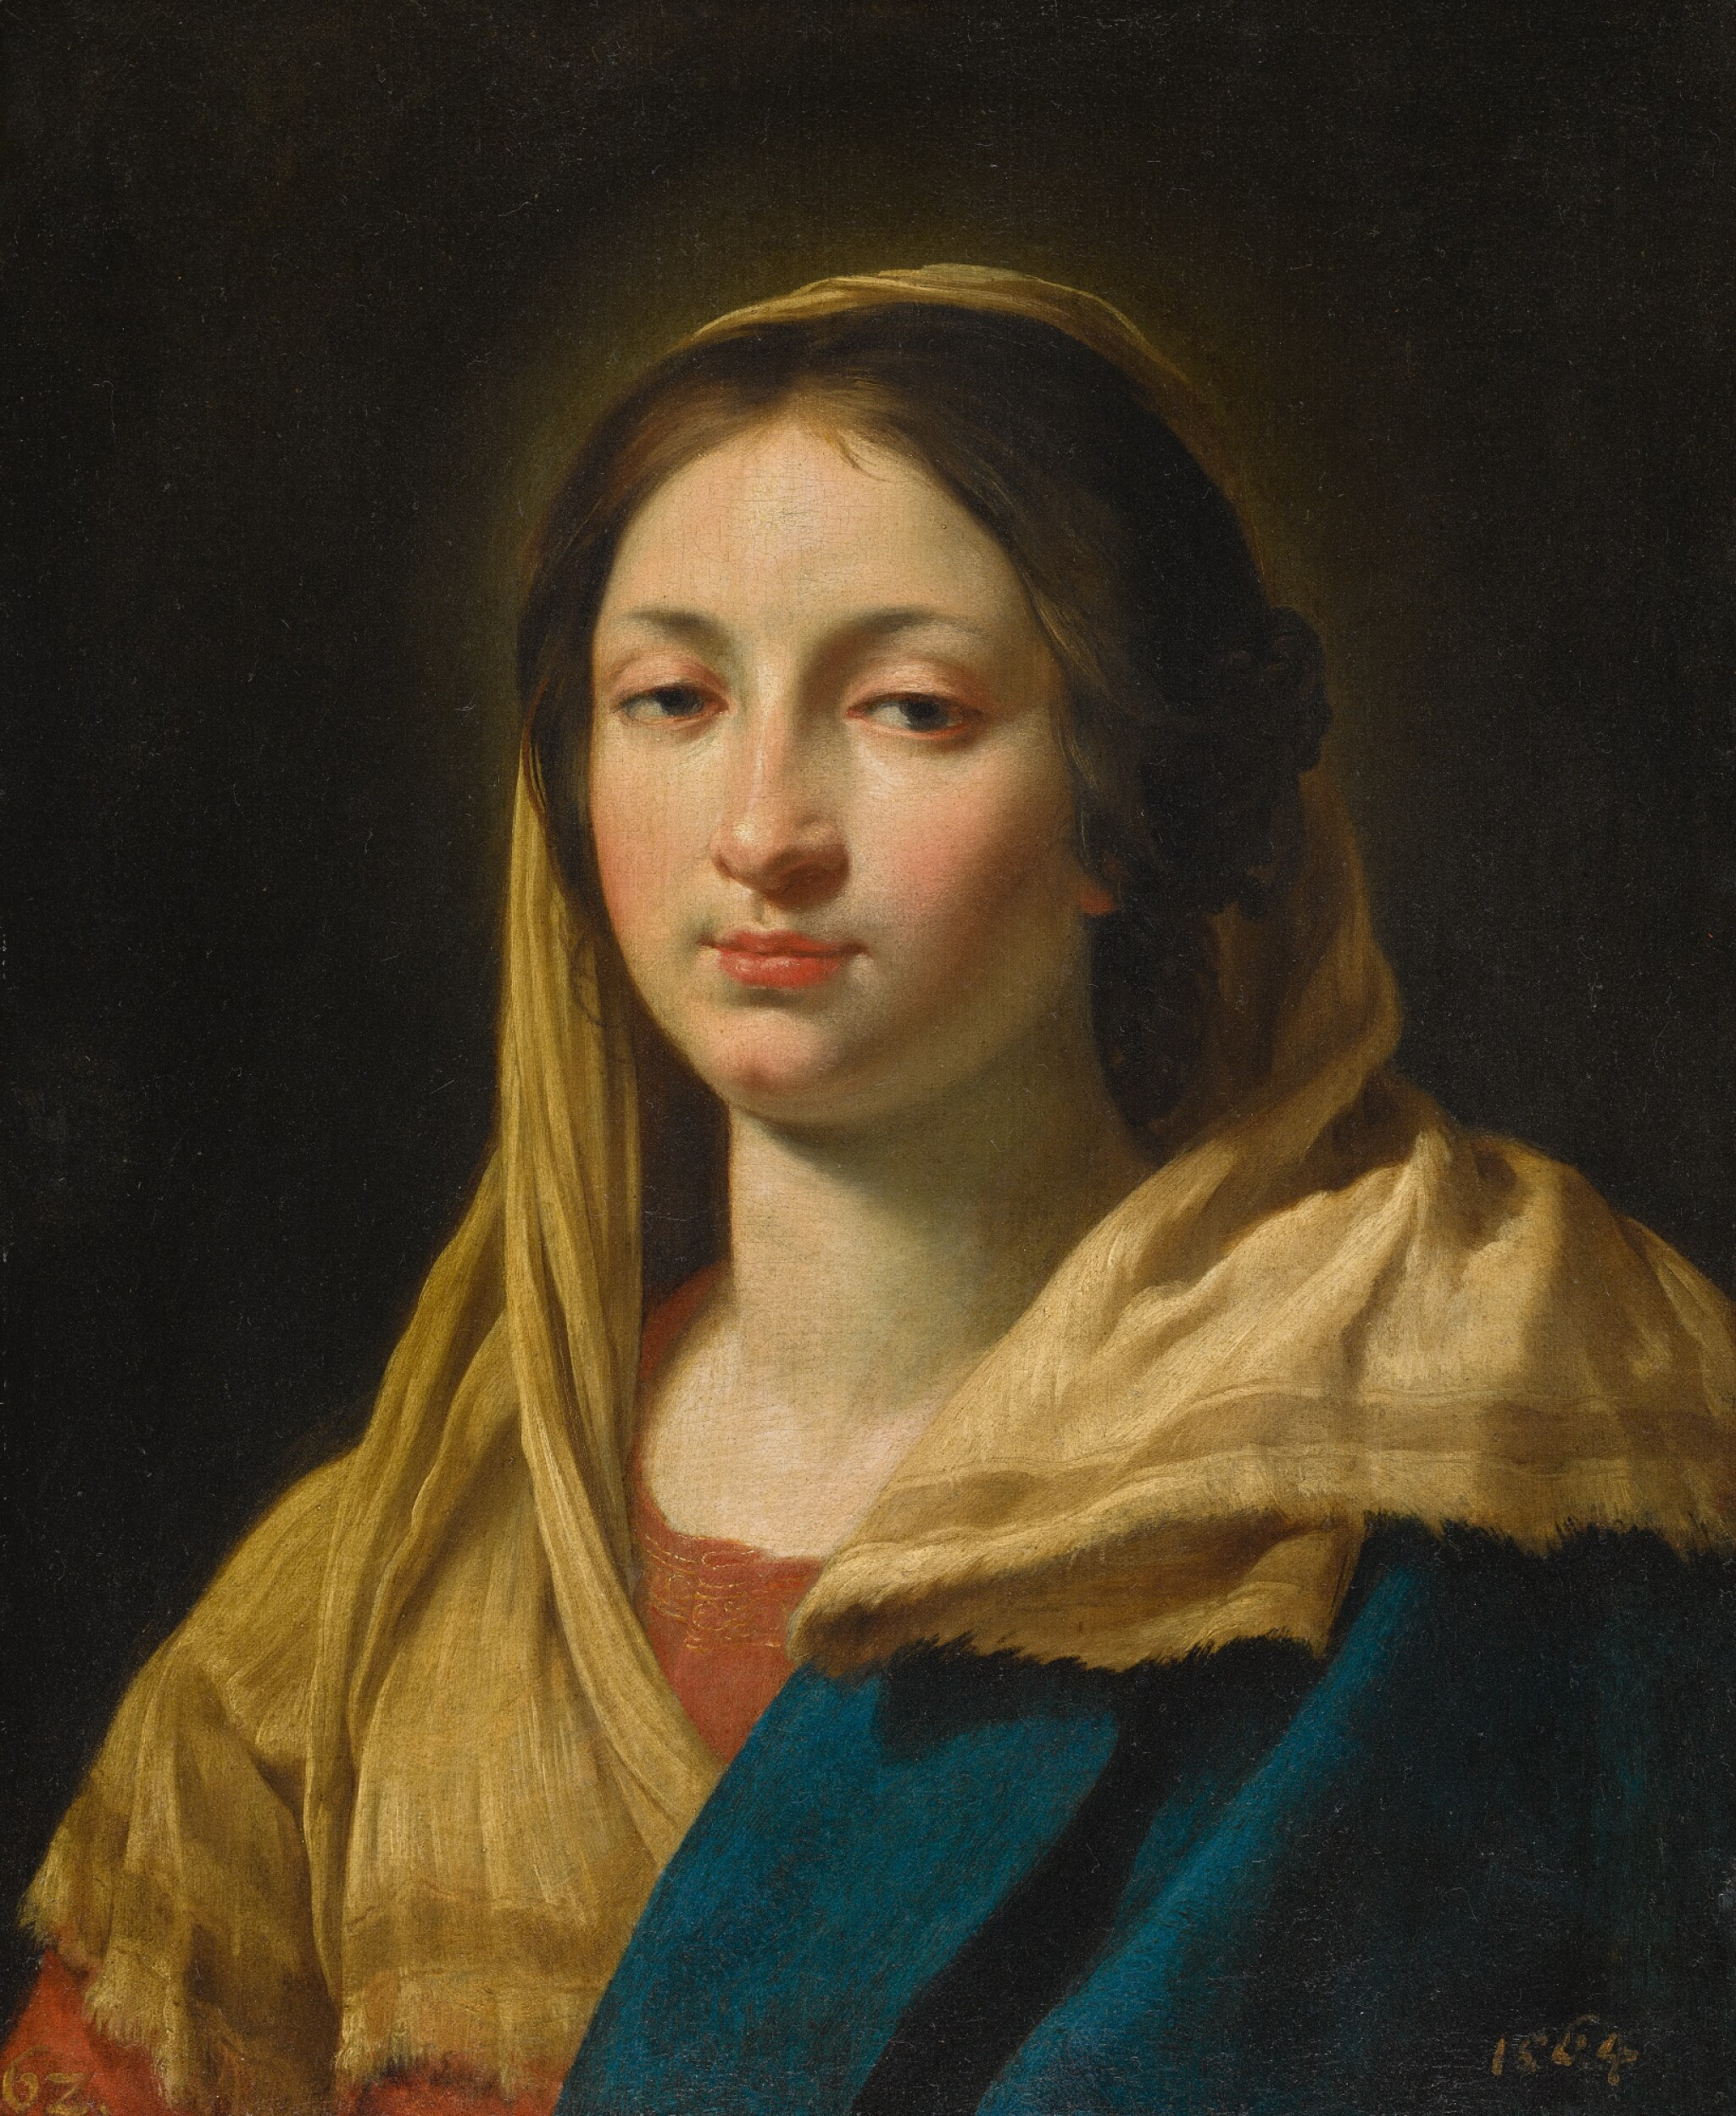 SIMON VOUET | Study of a young woman as the Virgin